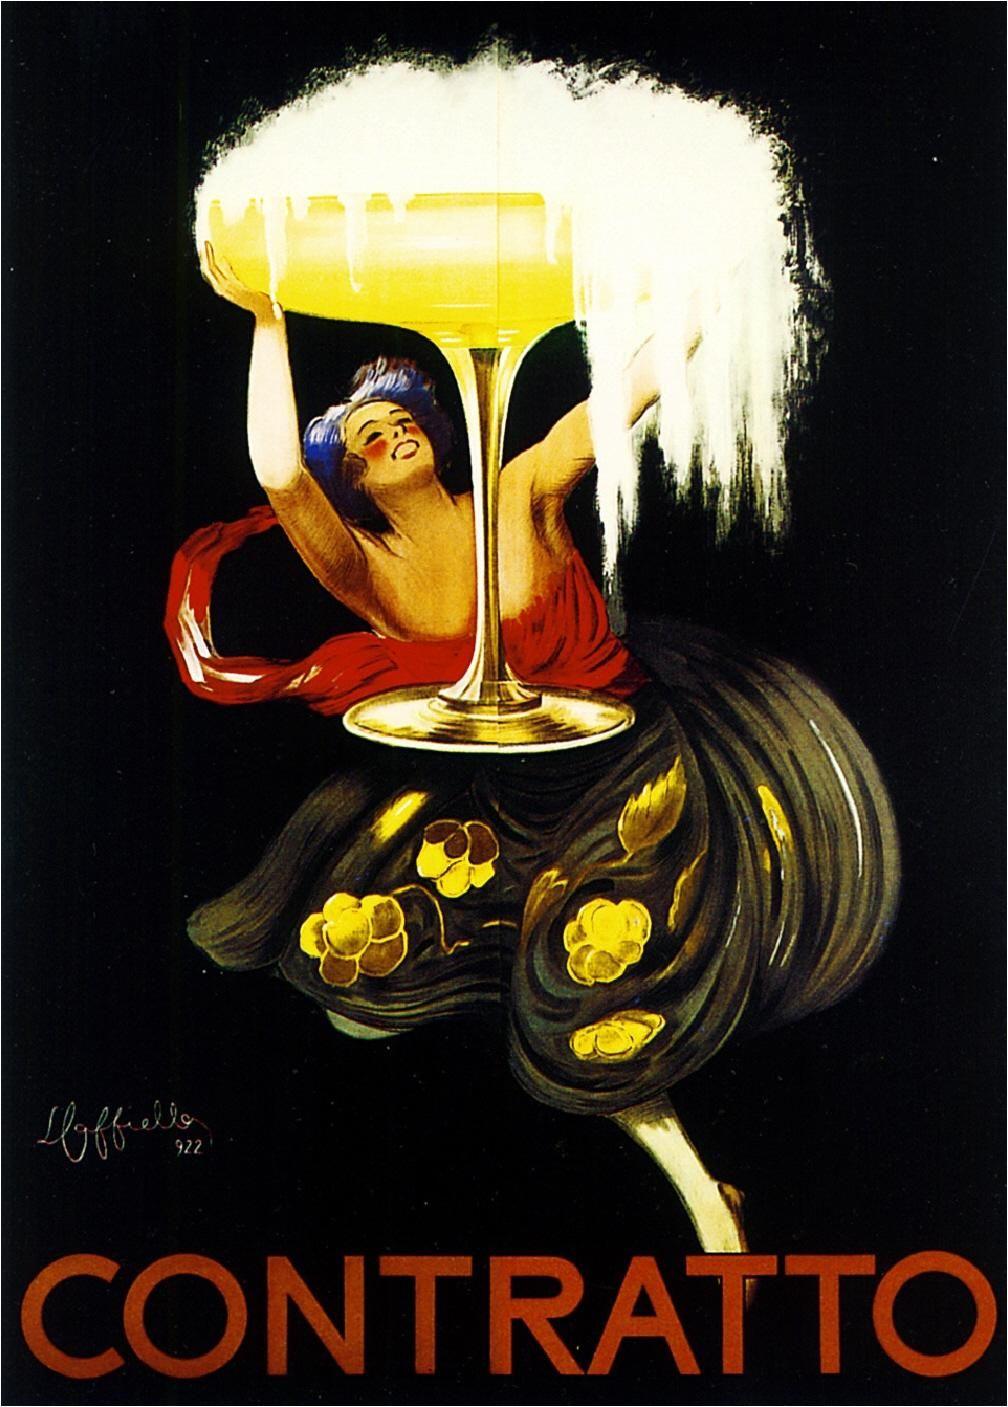 A3 A2 Contratto ChampagneVintage PosterA1